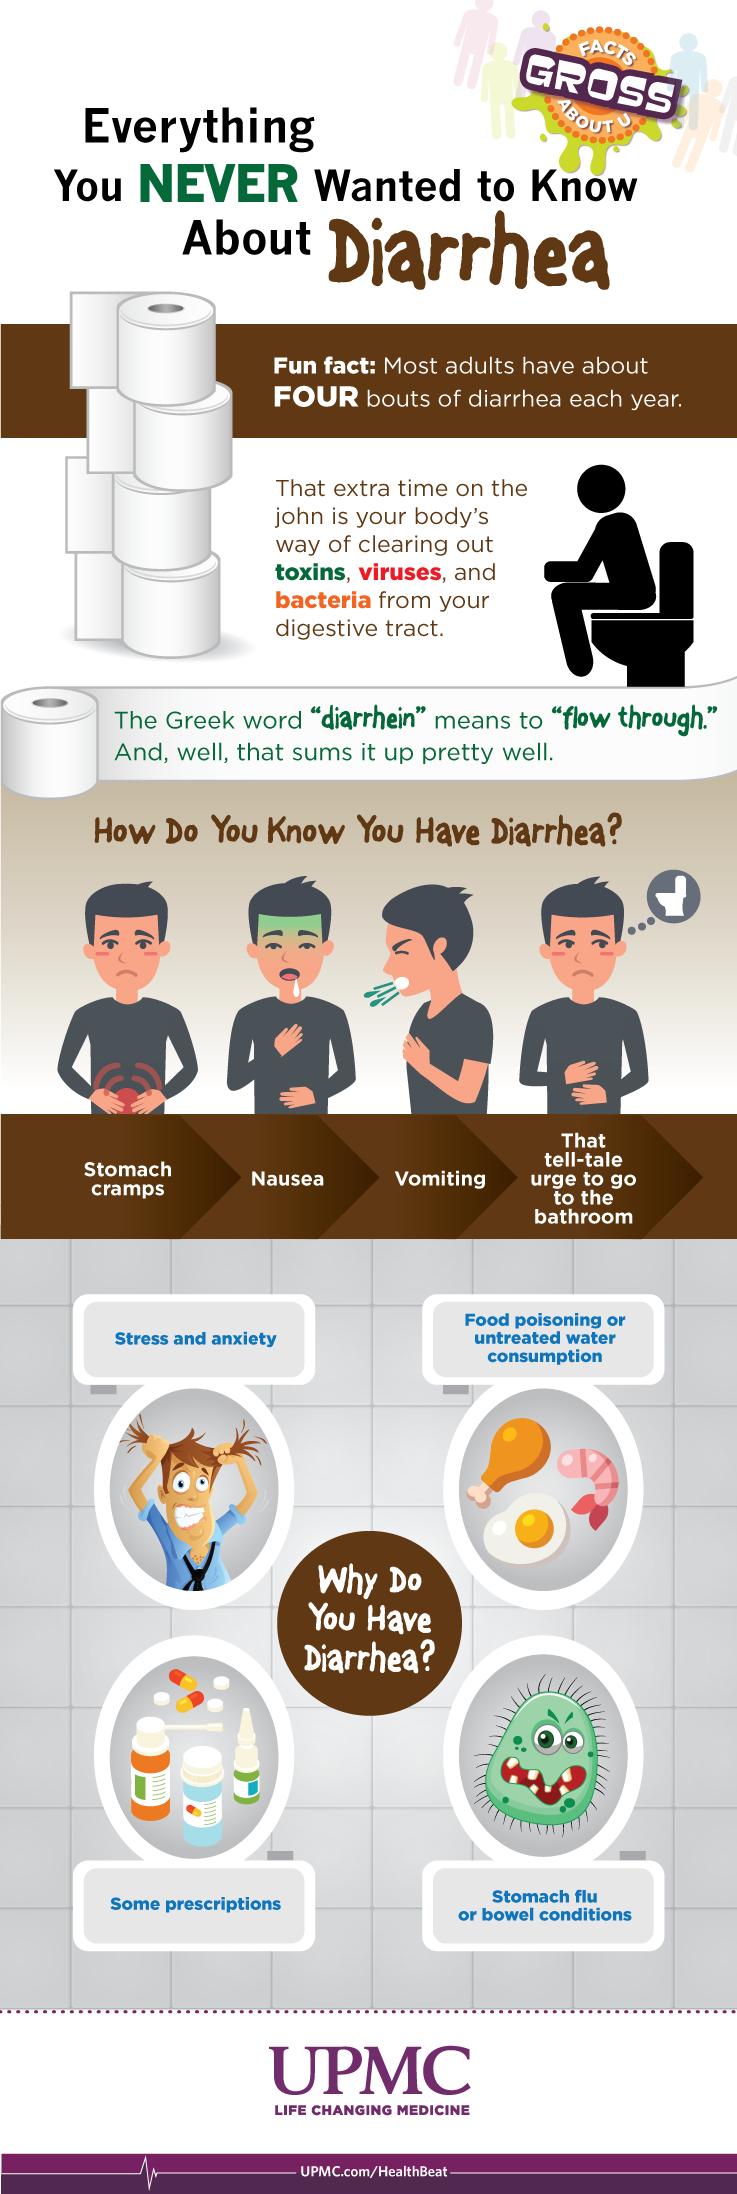 Diarrhea Symptoms and Causes